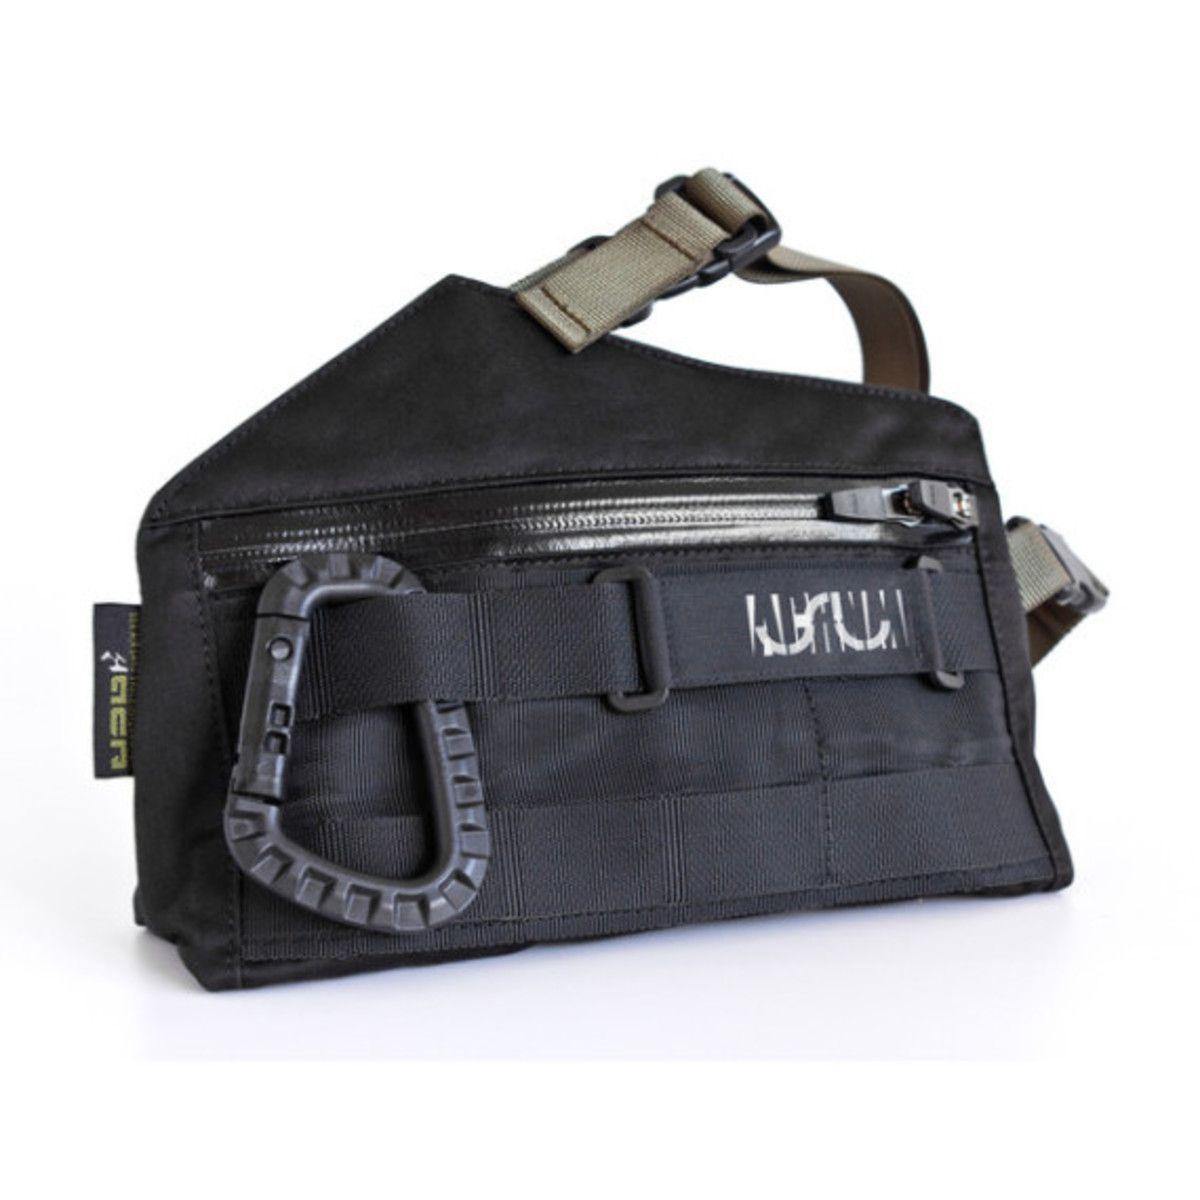 Uslu Airlines x ACRONYM 3A-12TS Bag   Sling bag   Waist pack ... 78d0cb8ab1